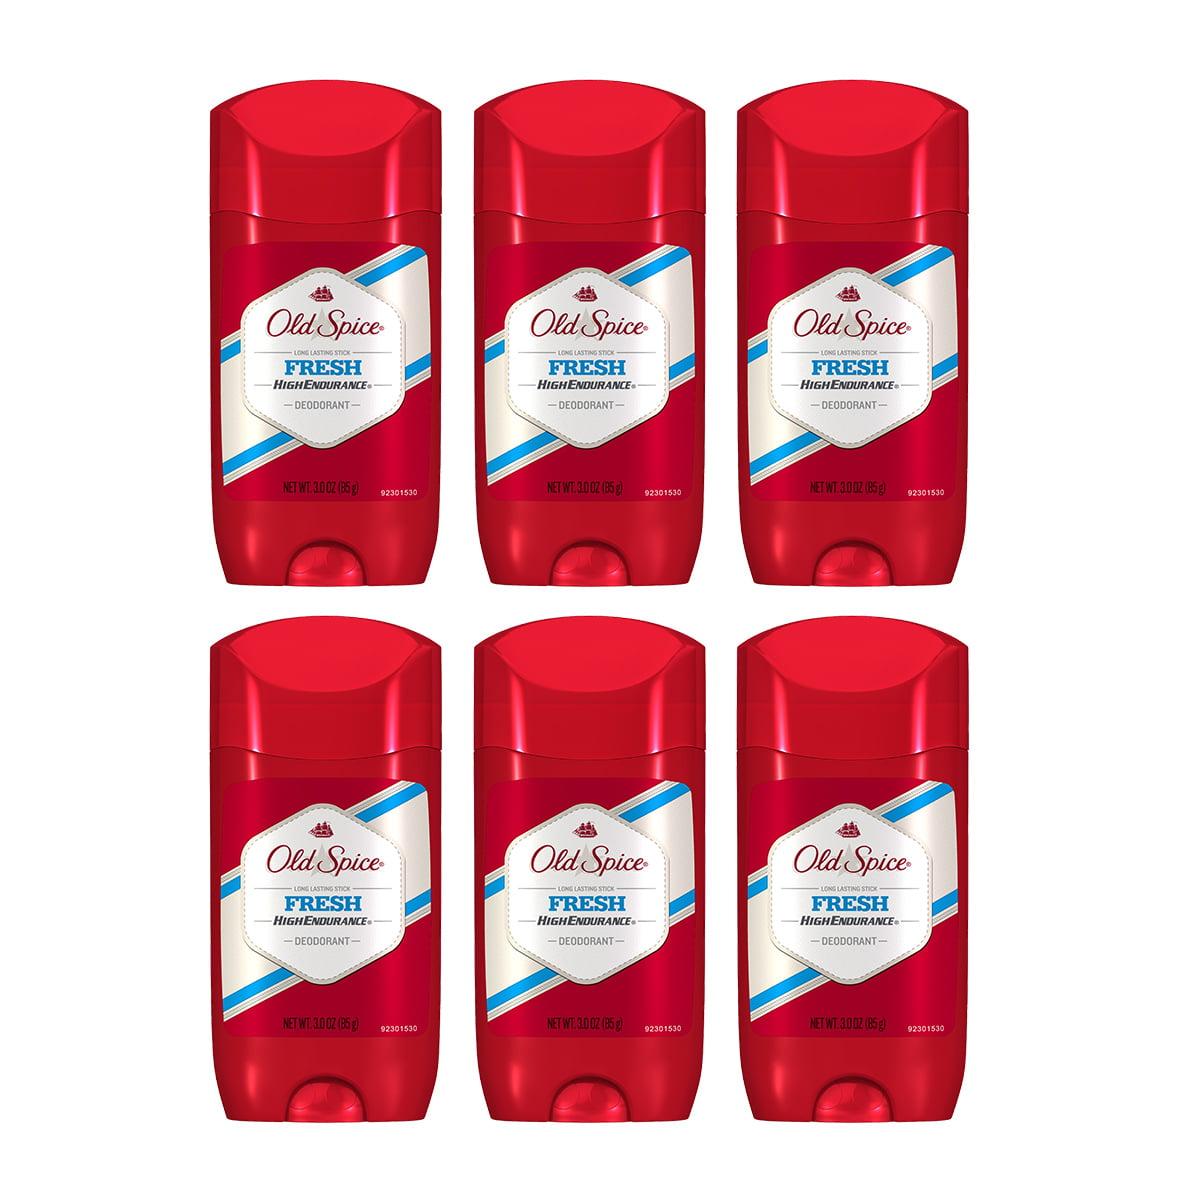 (6 Count) Old Spice High Endurance Fresh Deodorant 3 oz